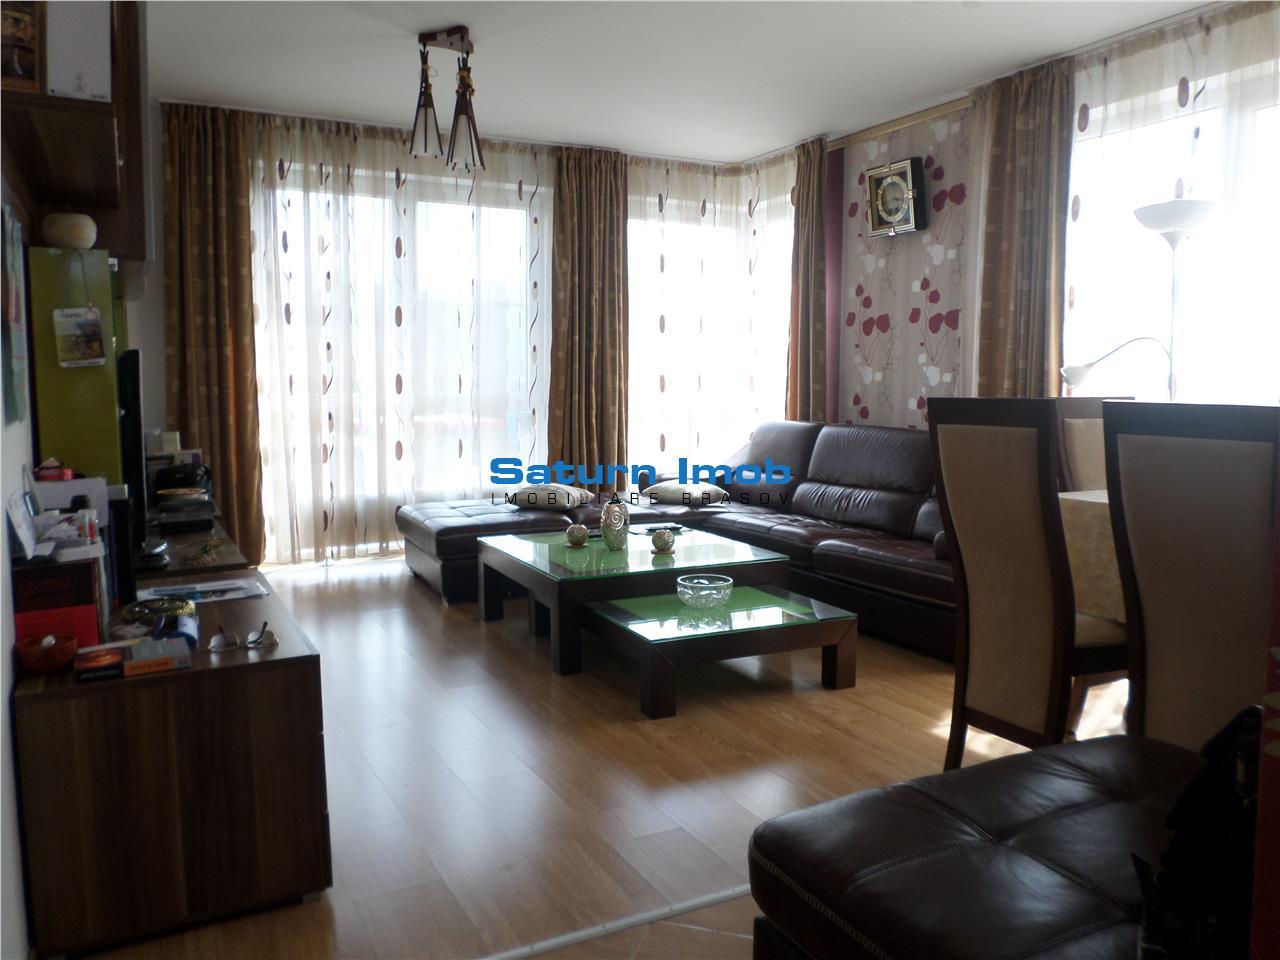 Vanzare apartament 3 camere Avantgarden 1, pozitie Privilegiata,Lux